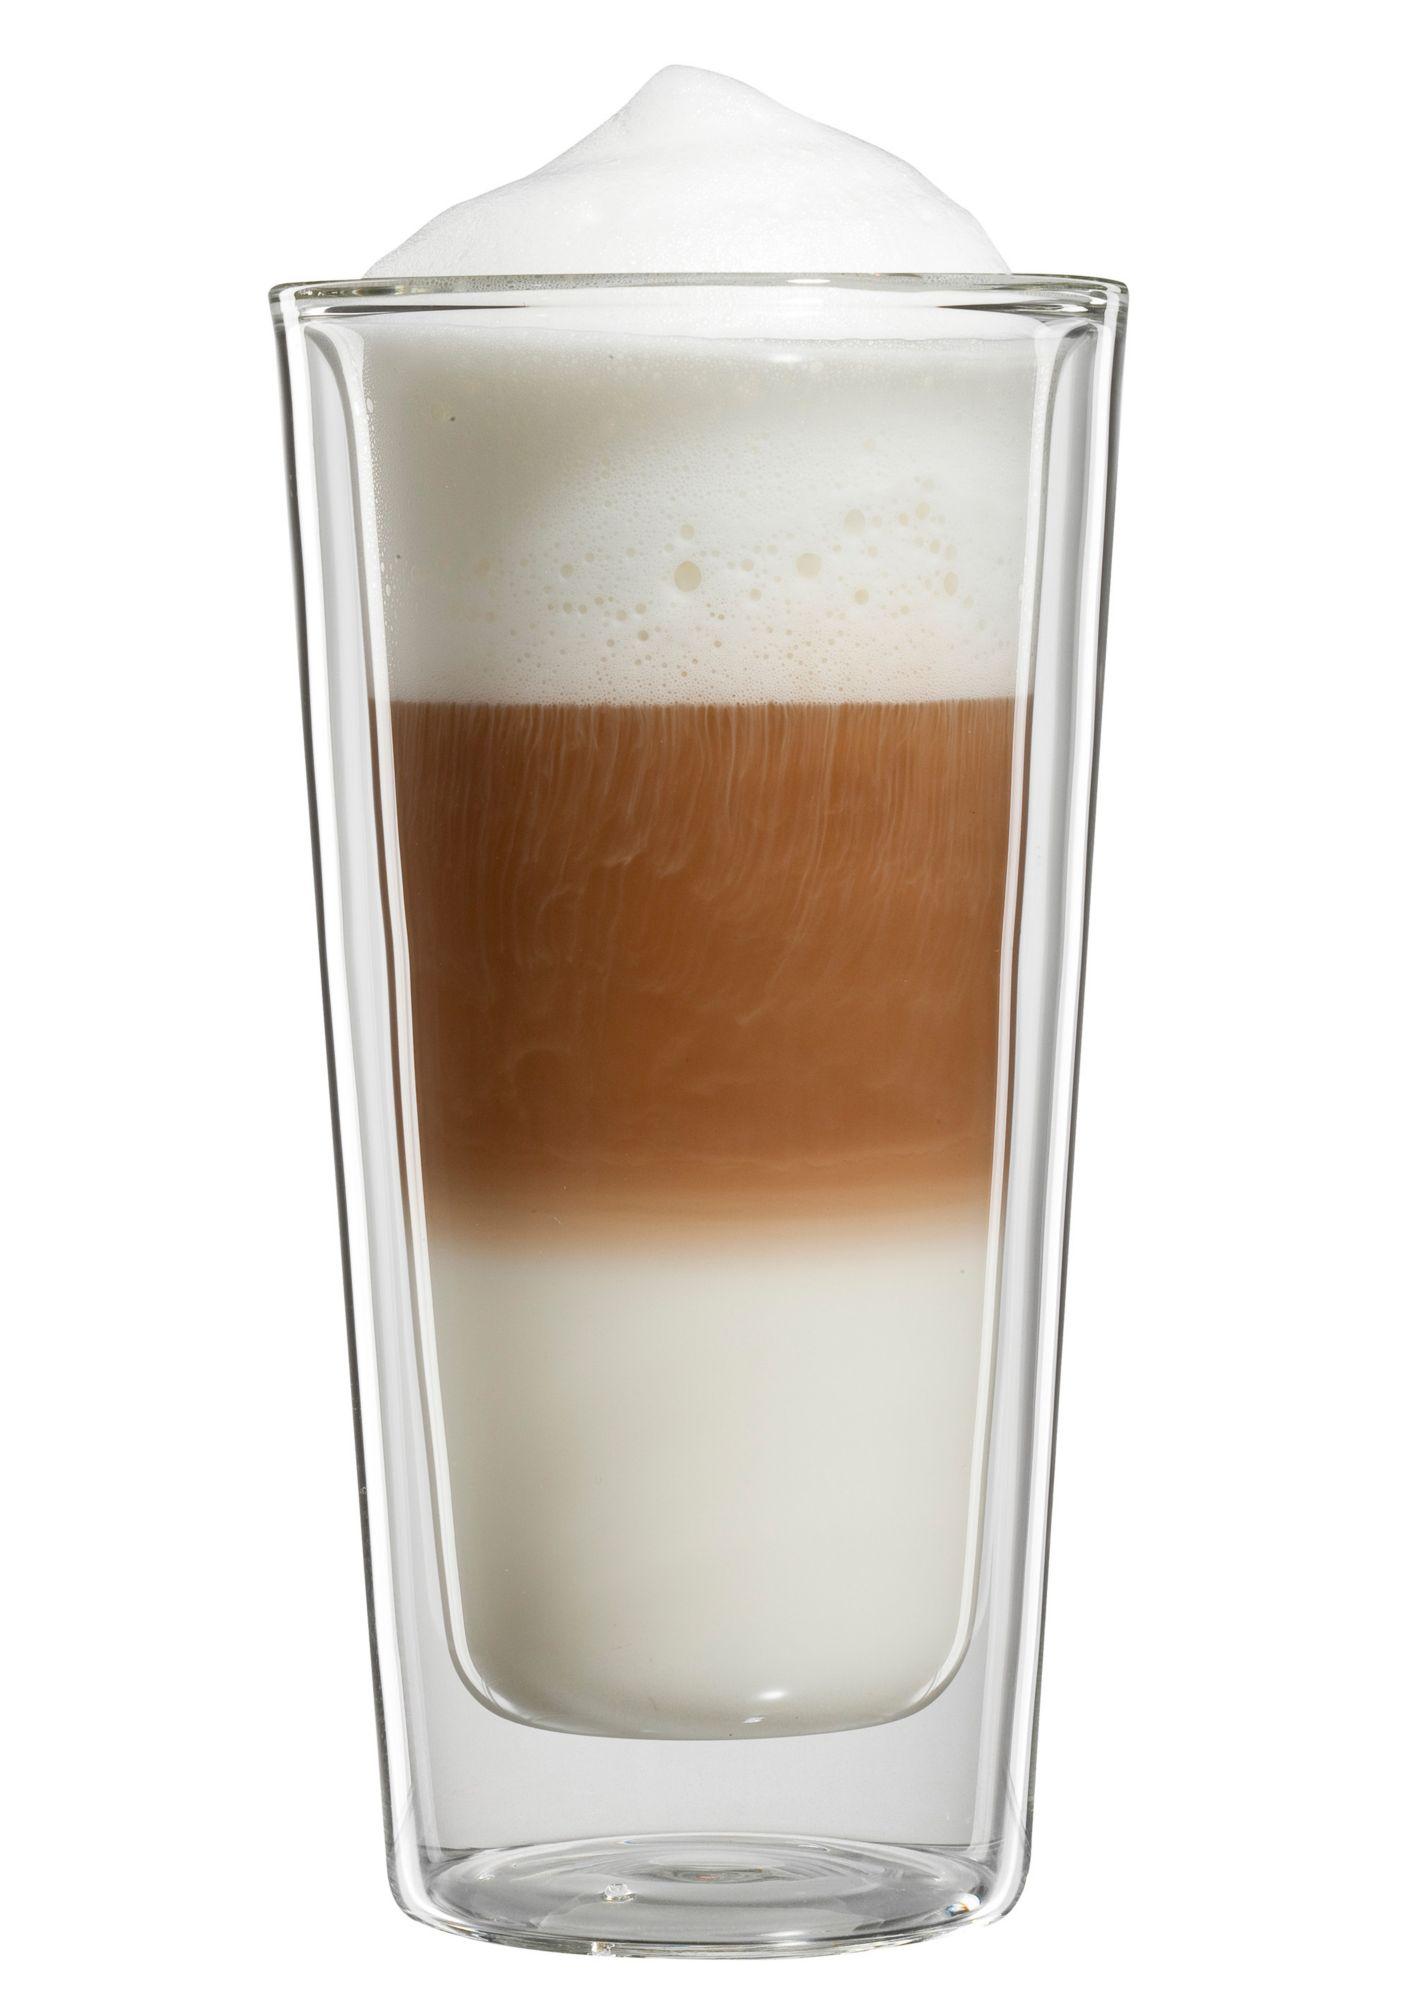 BLOOMIX bloomix Latte Macchiato-Glas, 4er Set, »Milano Grande«